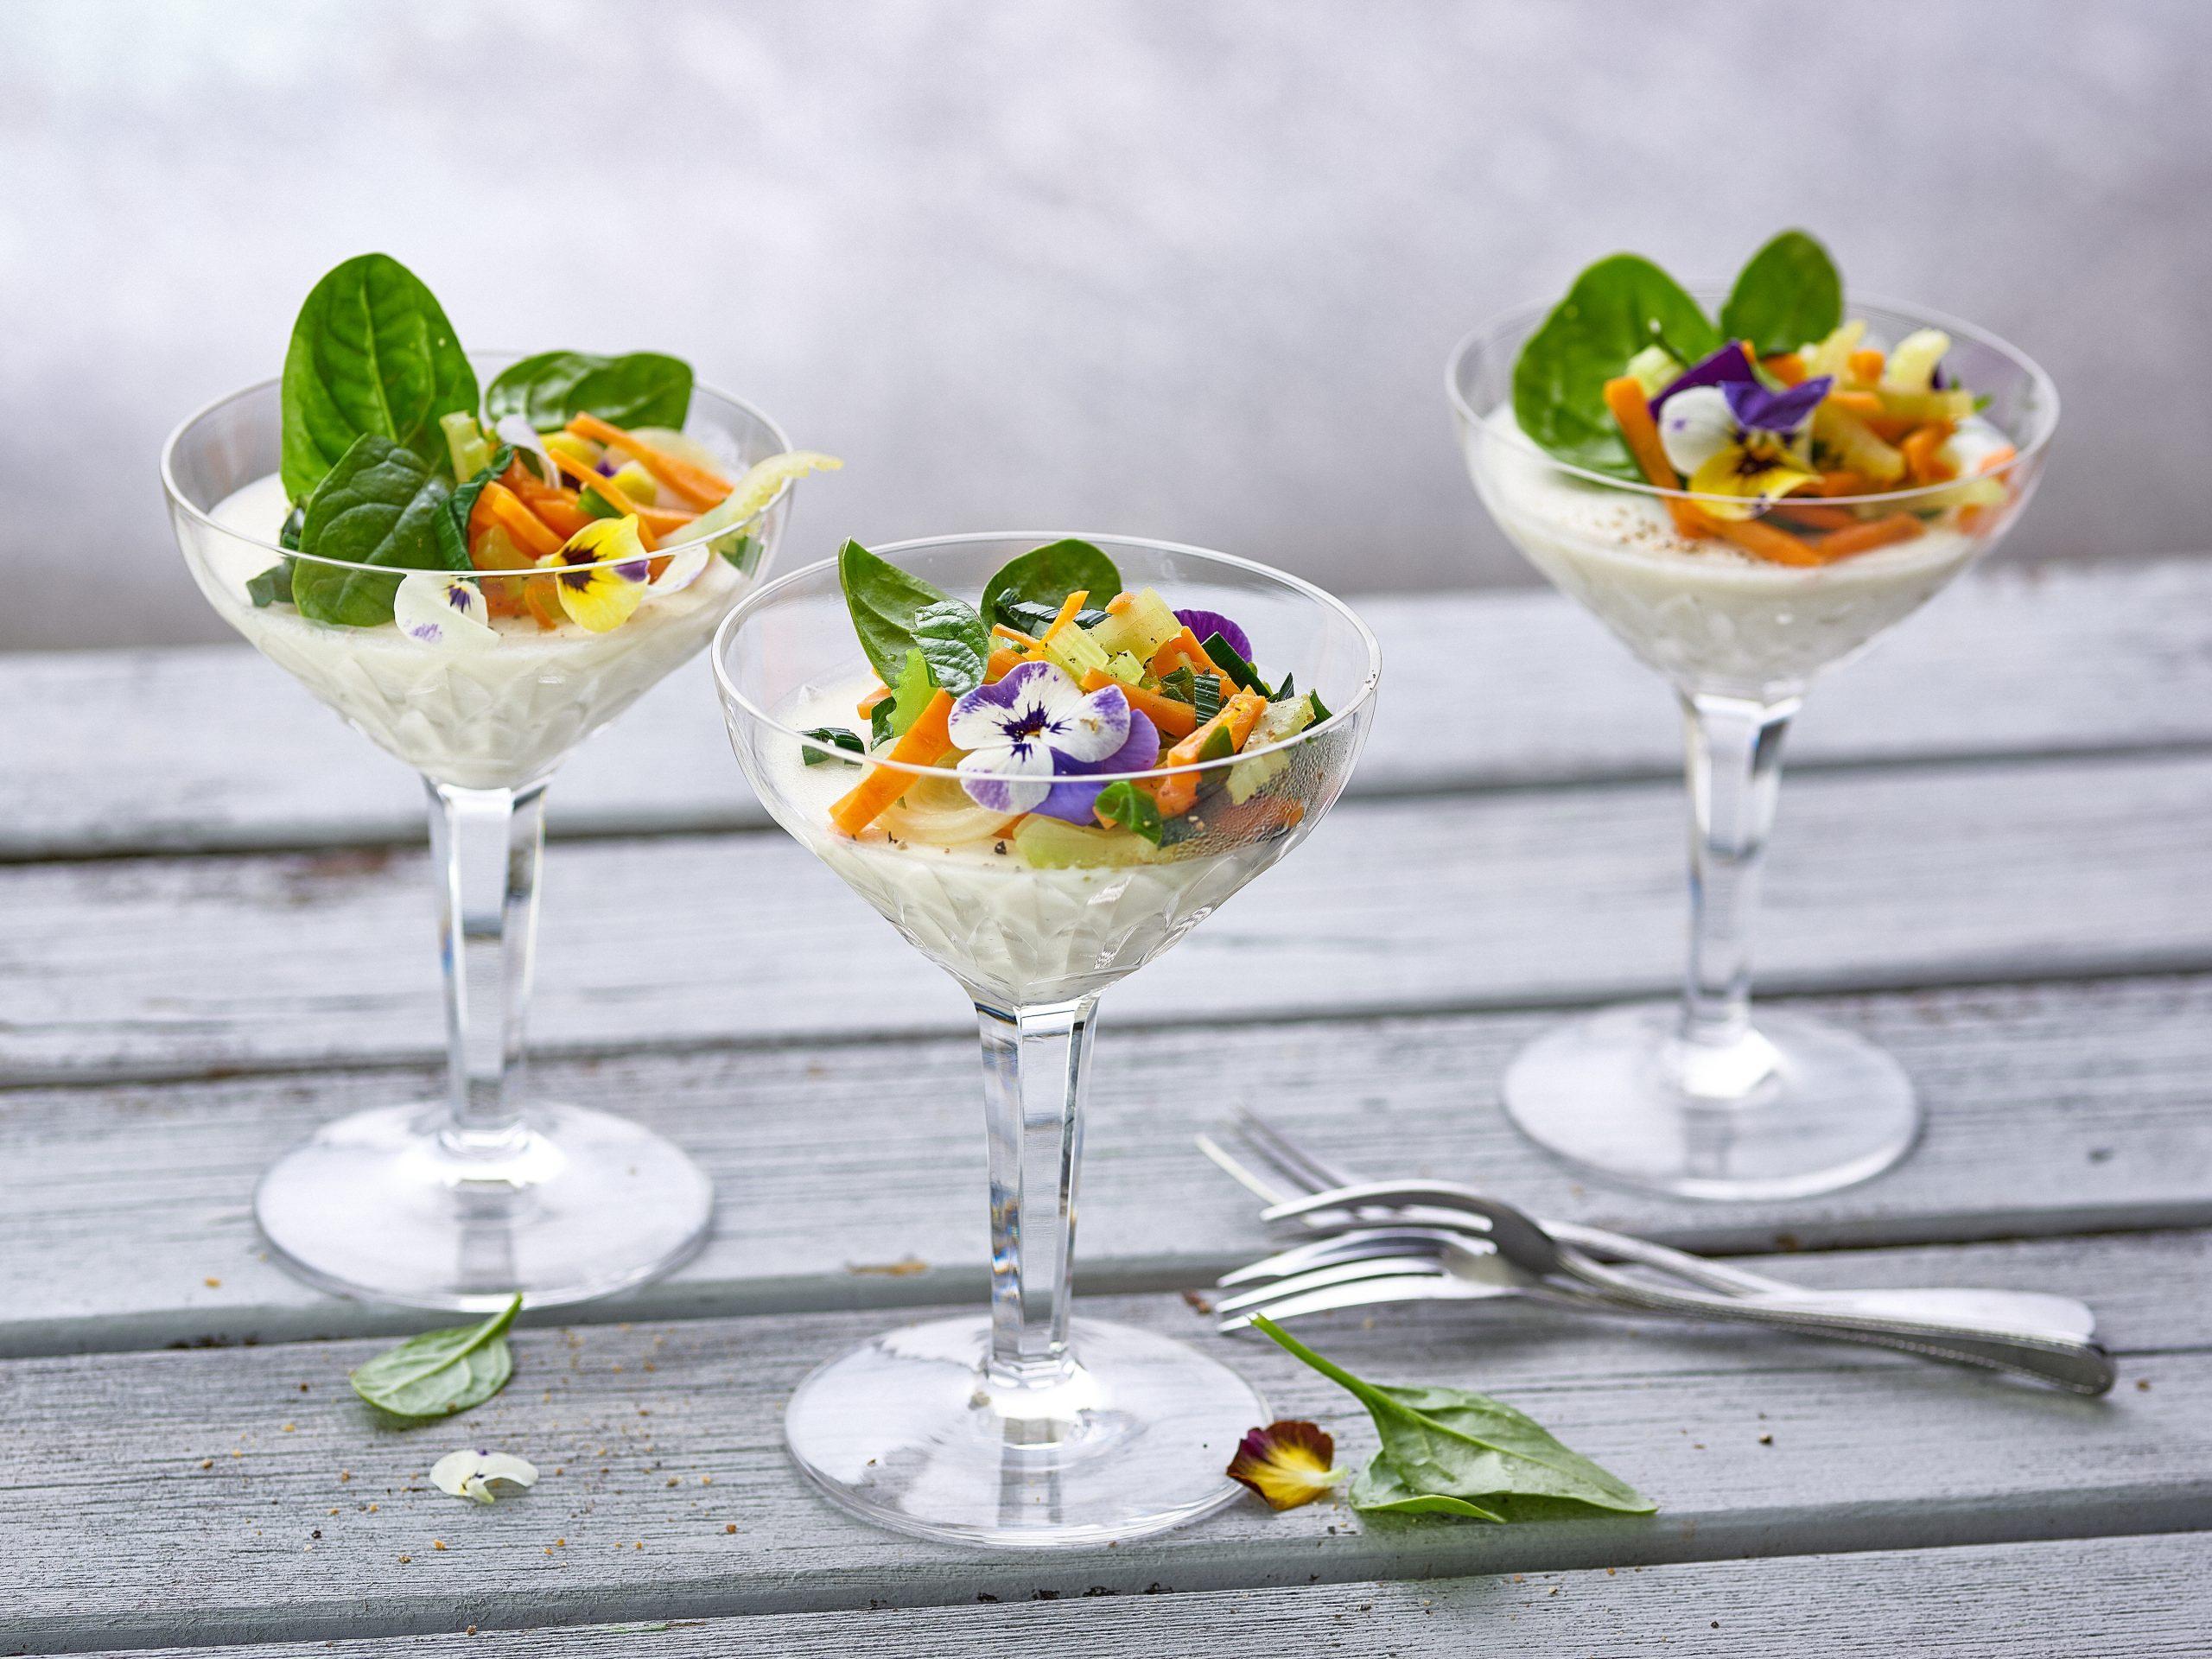 Mozzarella-Panna-cotta mit Gemüse-Salat